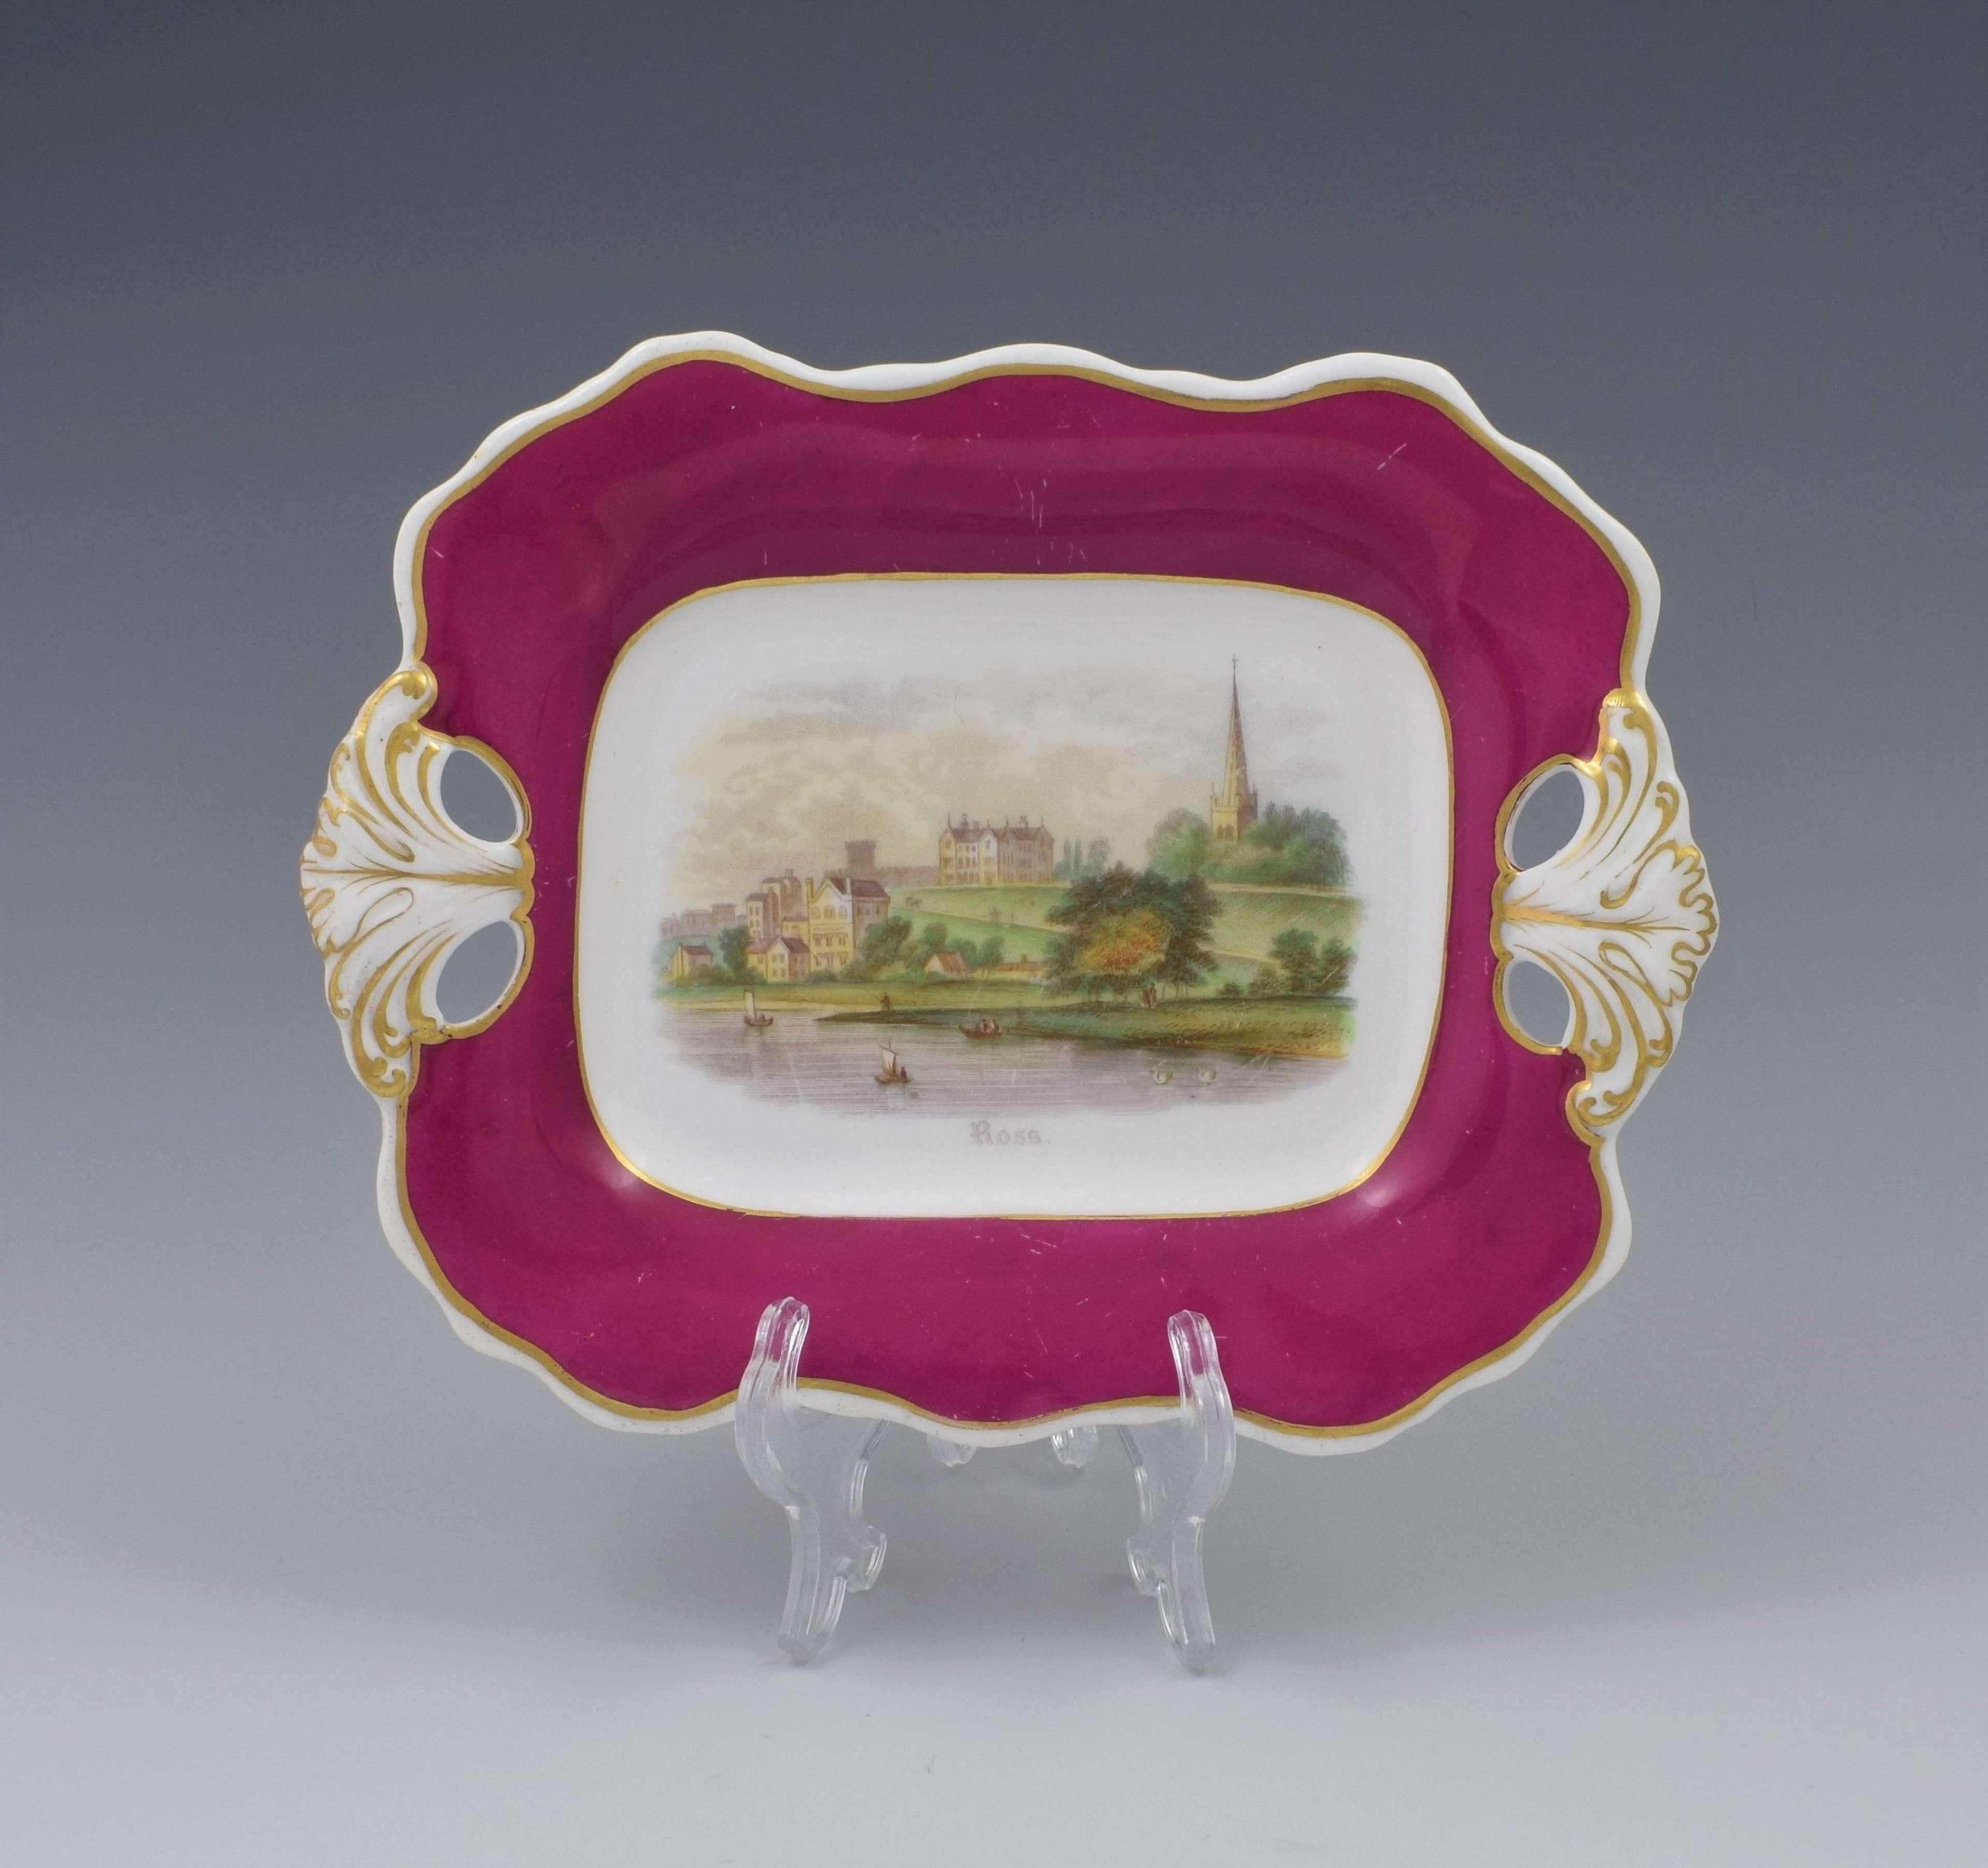 Antique Davenport Porcelain Dessert Dish View Of Ross-On-Wye c.1840